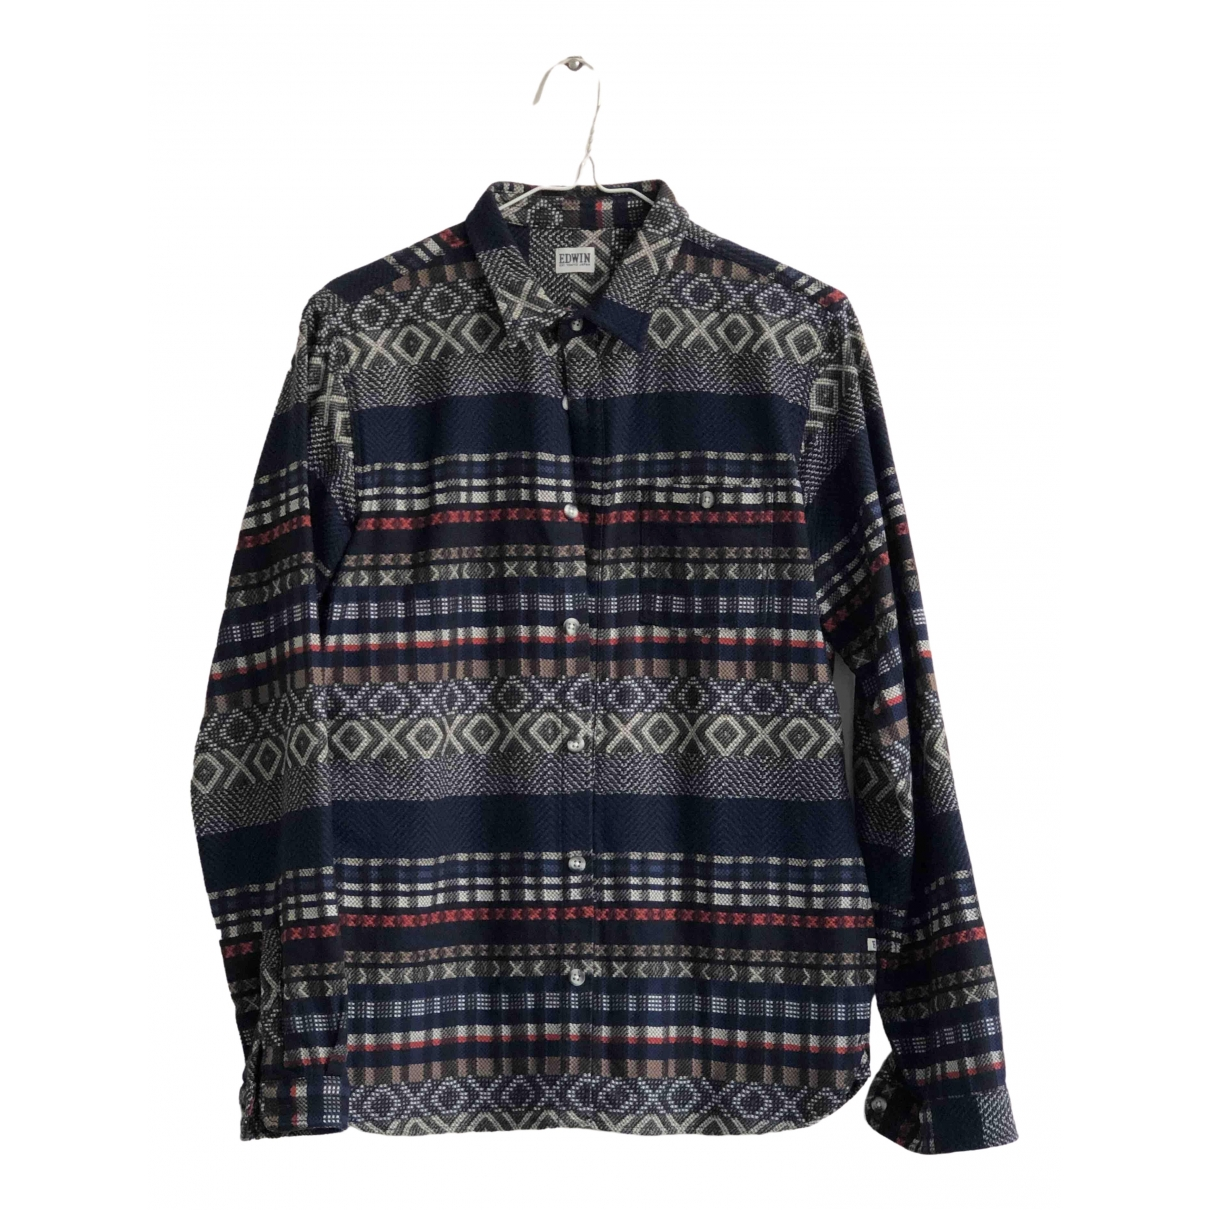 Edwin \N Cotton Shirts for Men S International